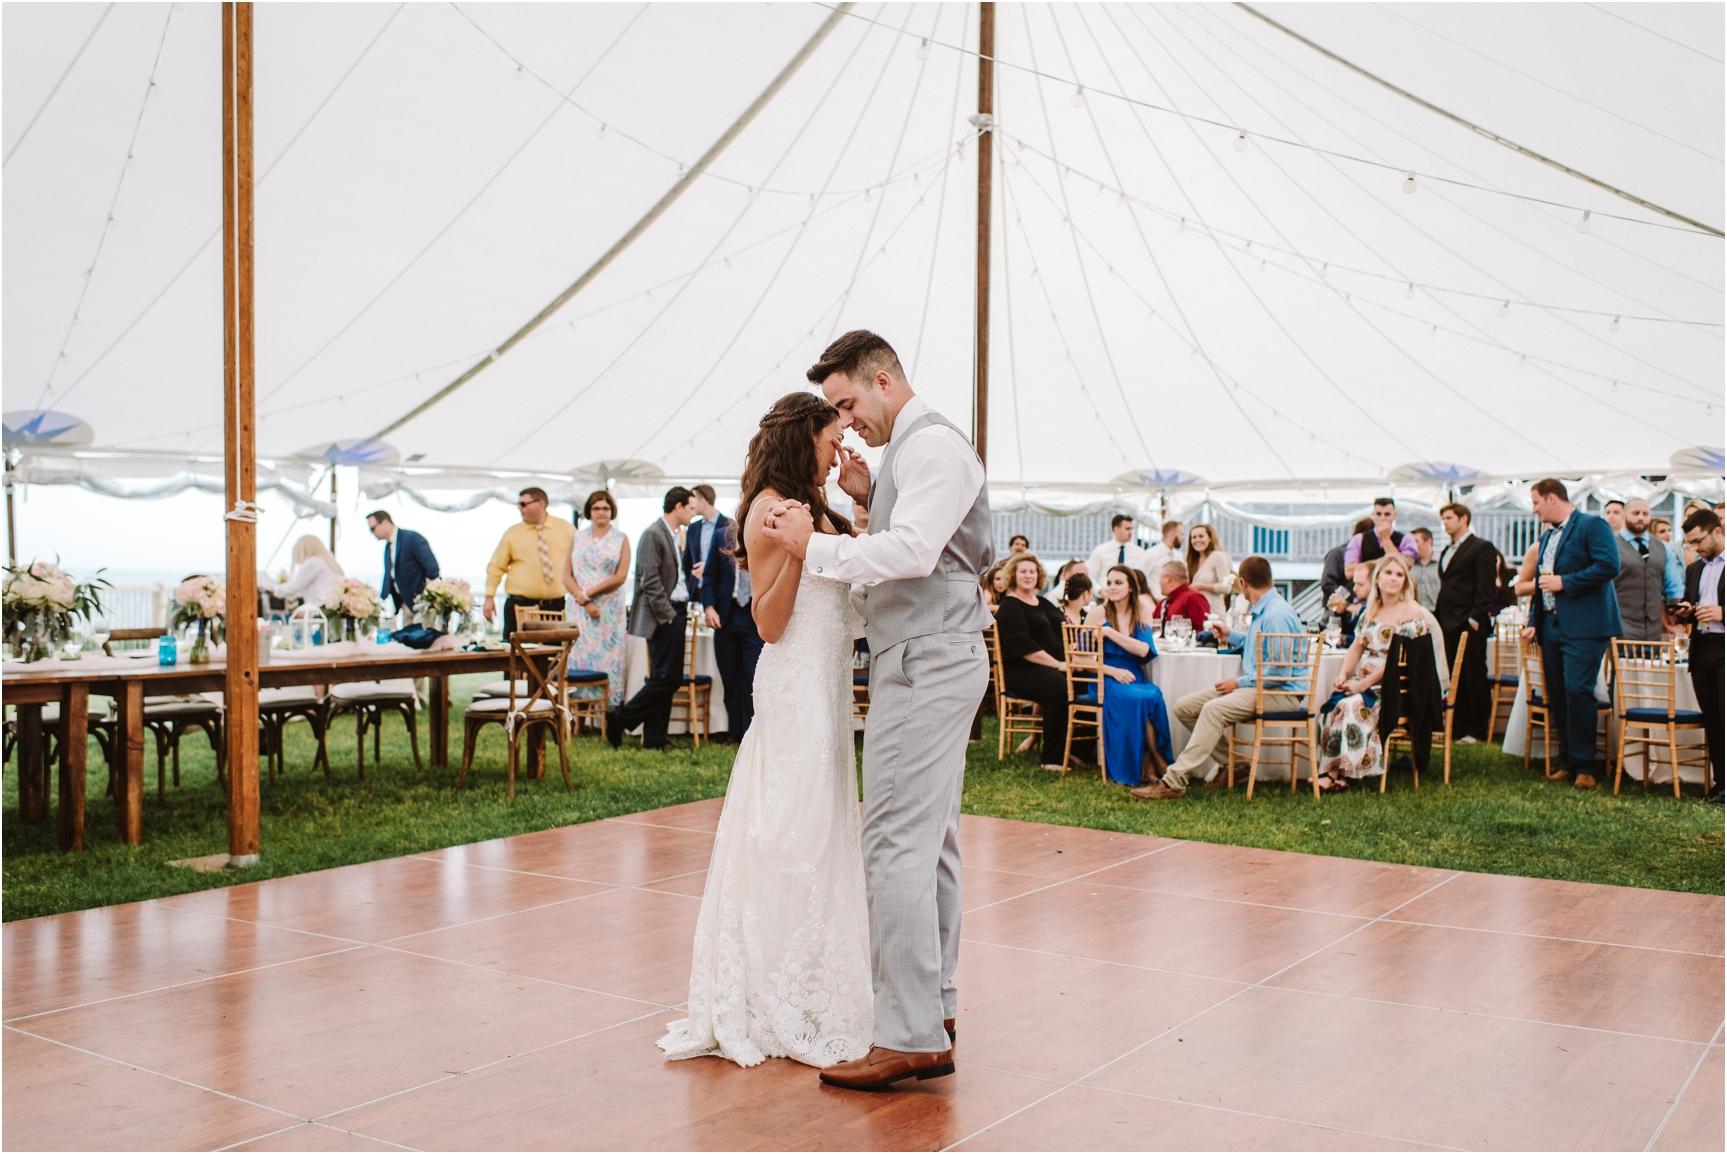 Sarah & Sam Pelham House Cape Cod Wedding Photographer-147.jpg